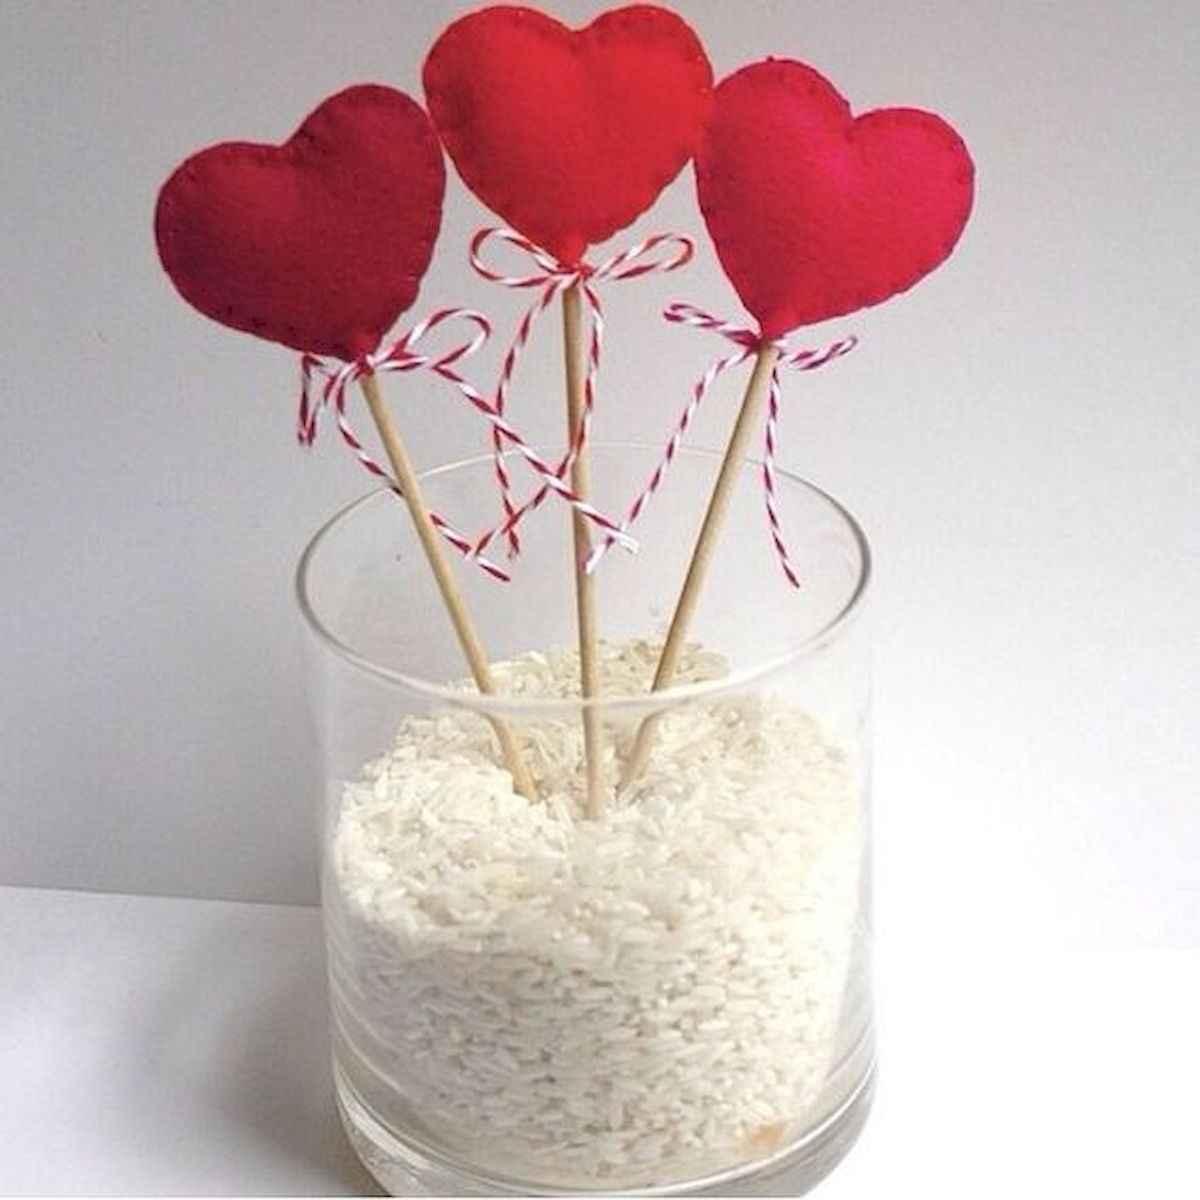 75 Romantic Valentines Day Crafts Design Ideas (65)